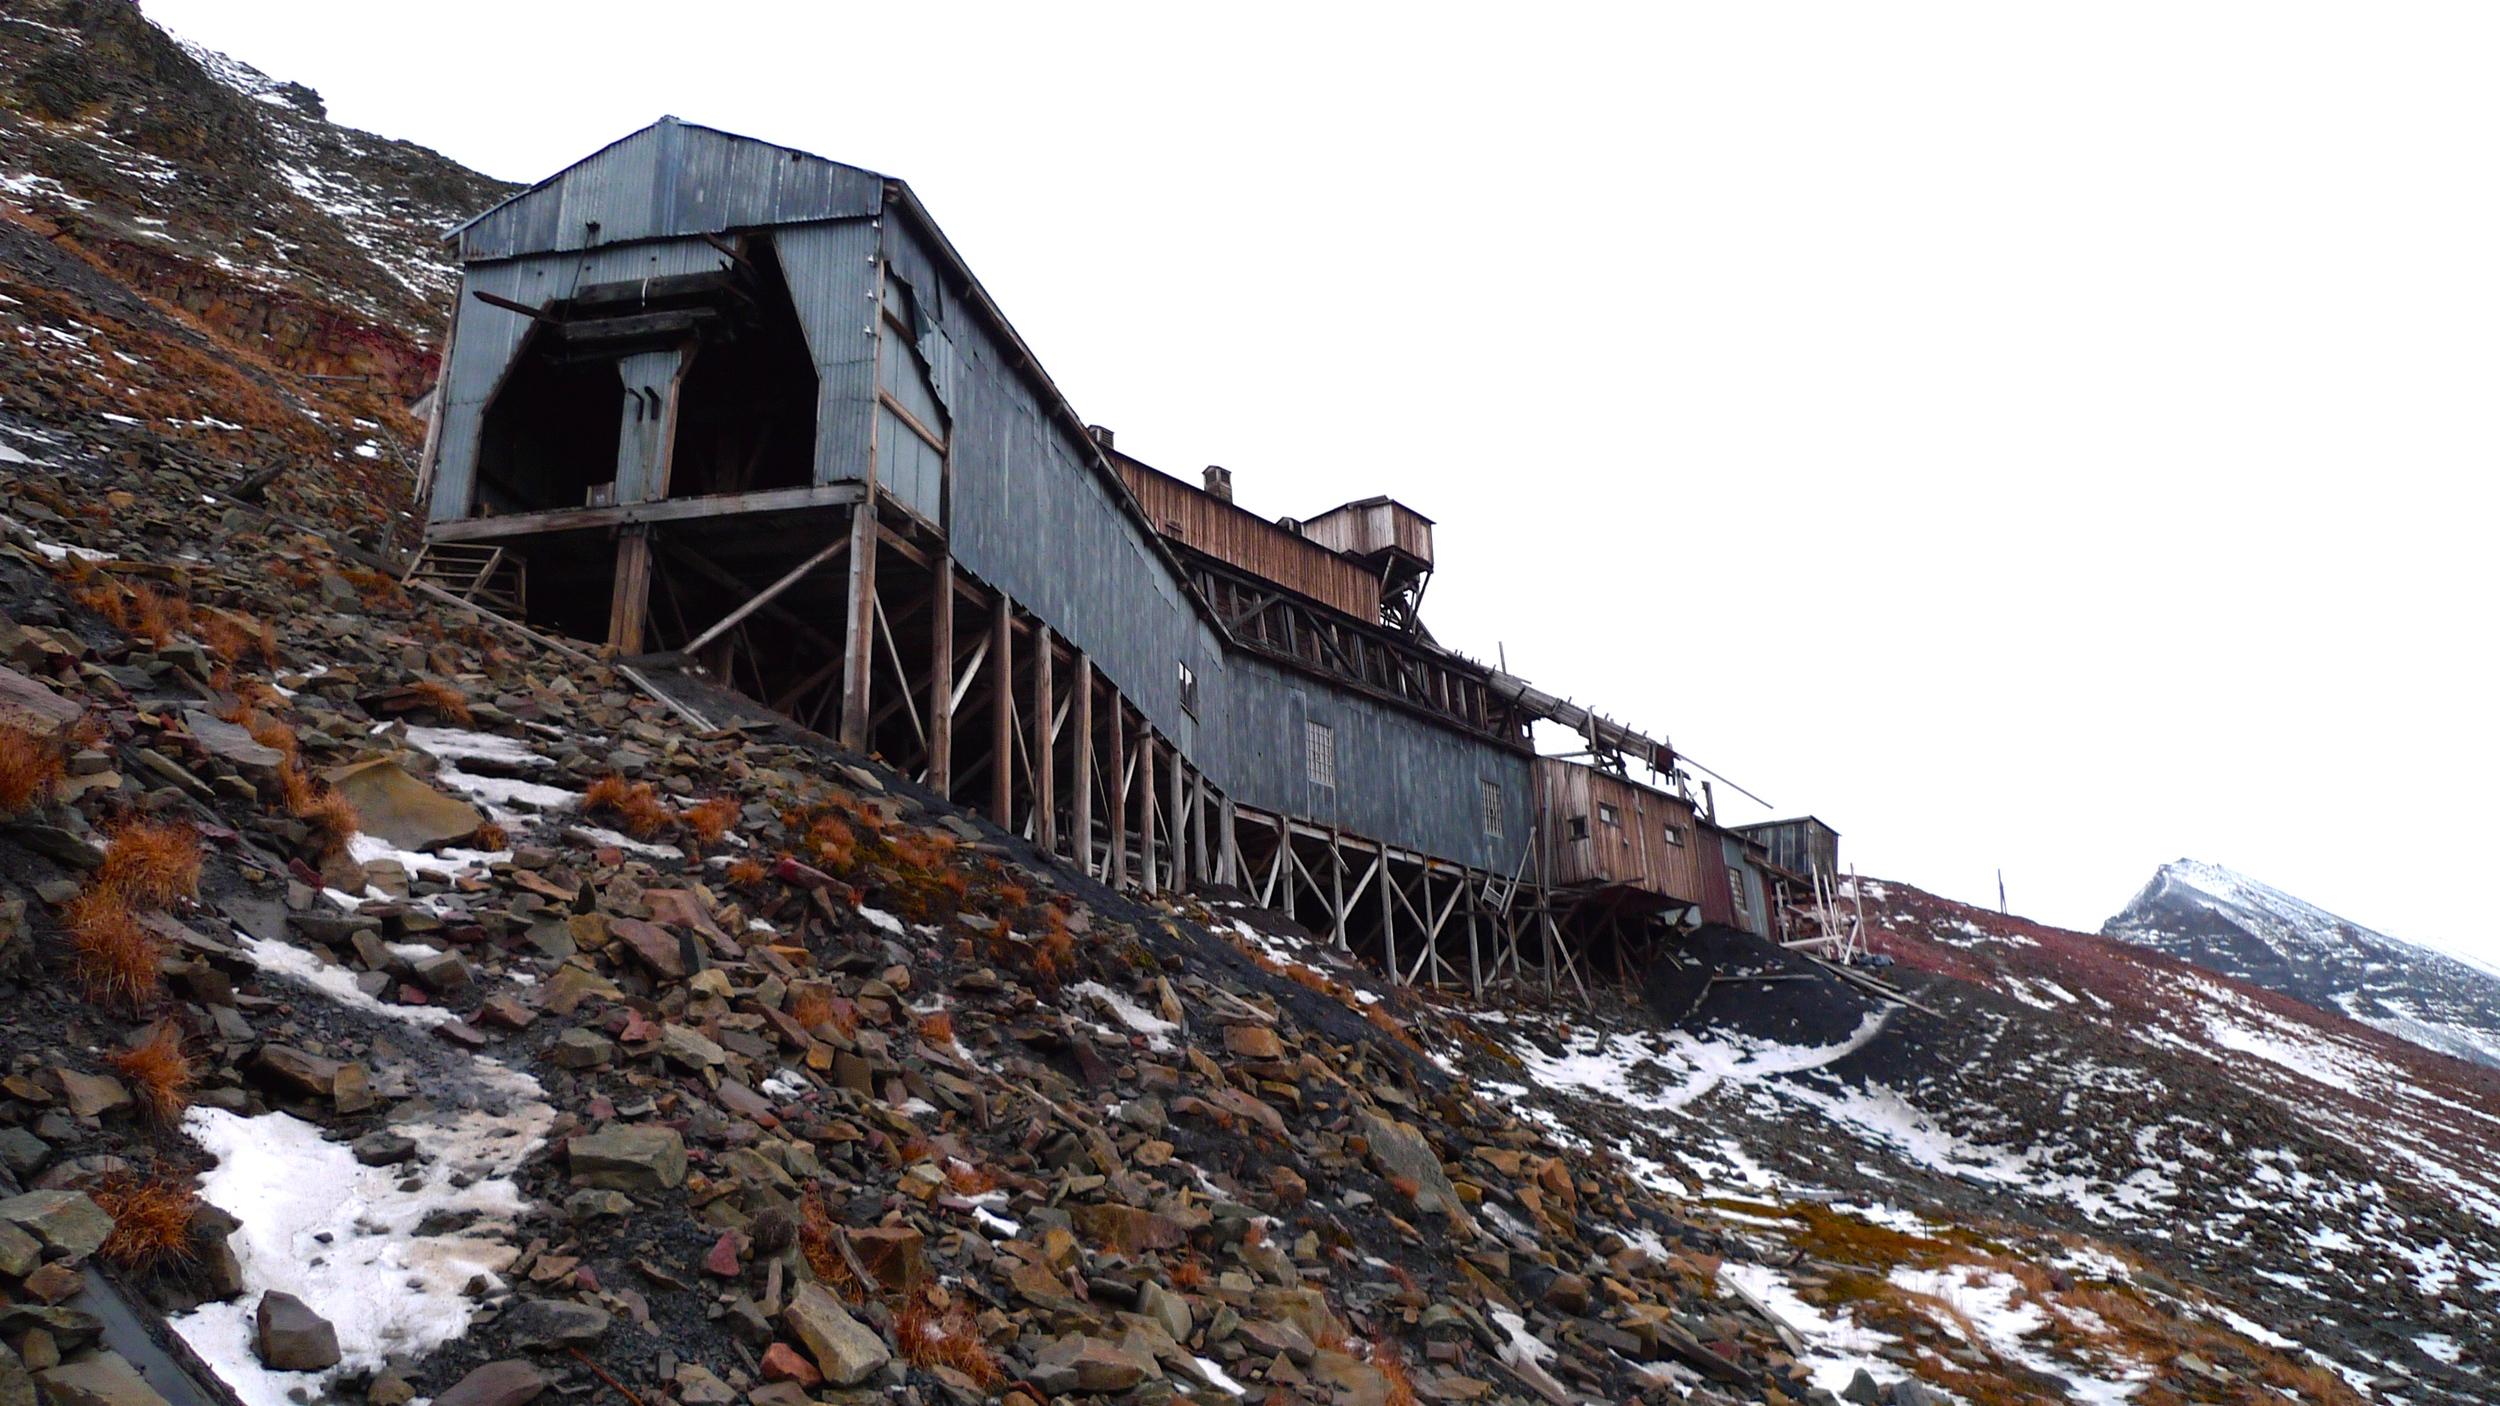 The Santa Clause Mine